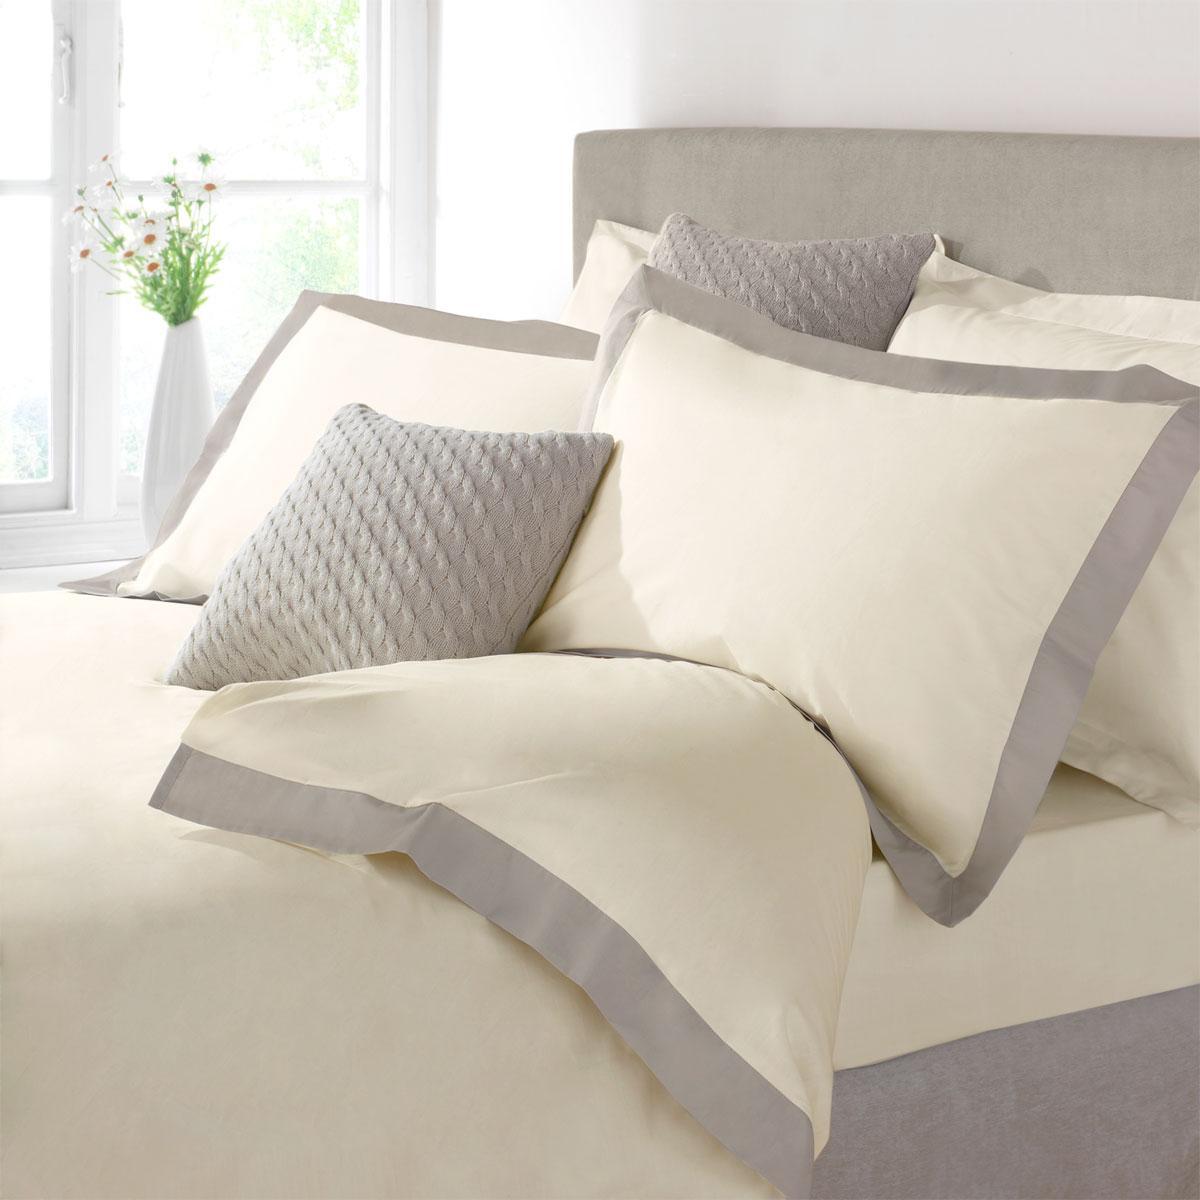 Portland luxury bedding by julian charles cream luxury duvet covers